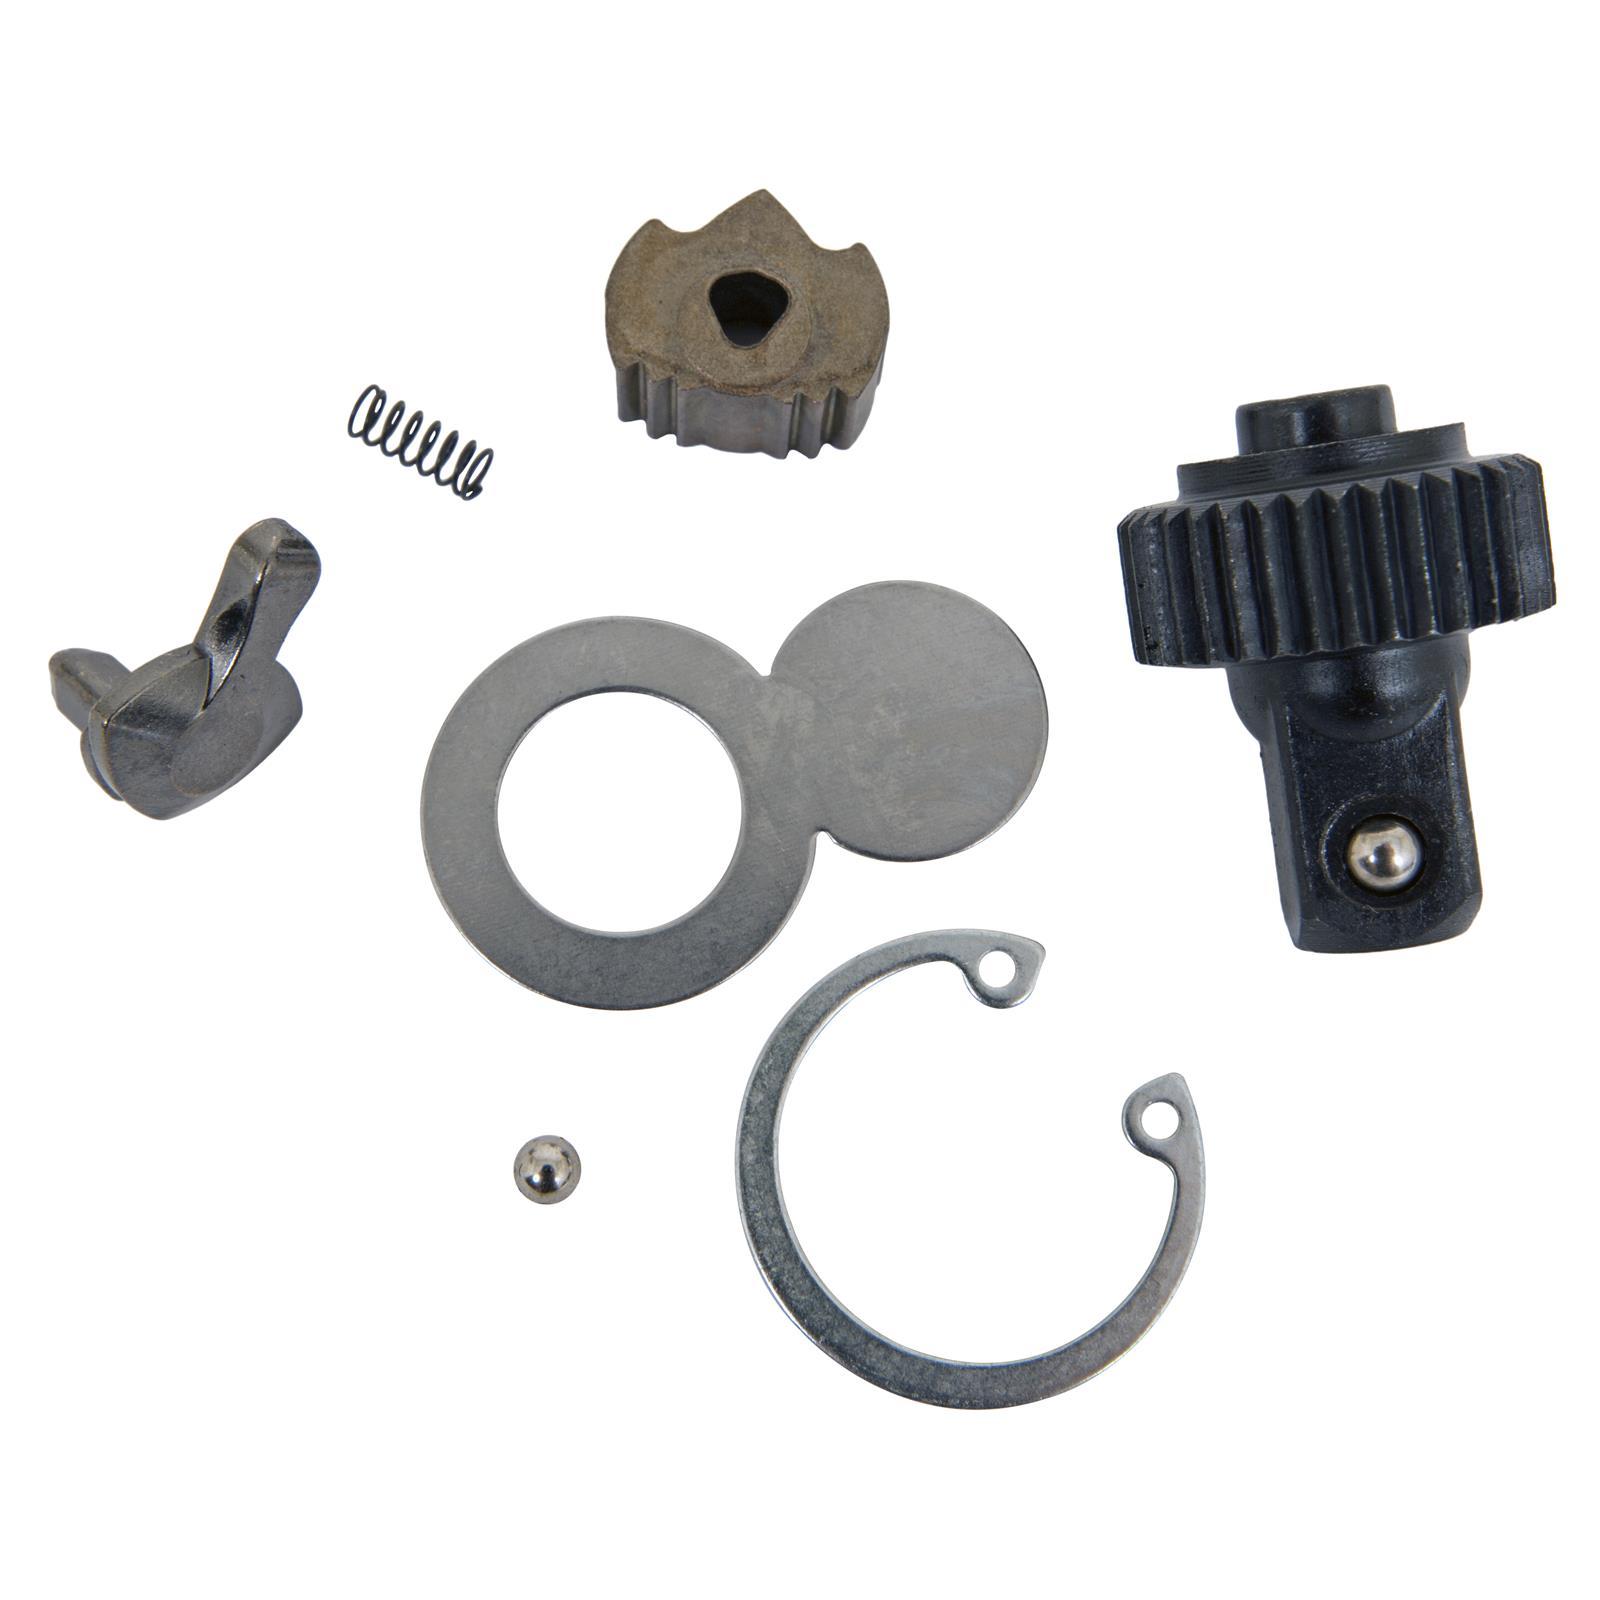 Craftsman 009-43434 Craftsman Ratchet Repair Kits | Summit Racing